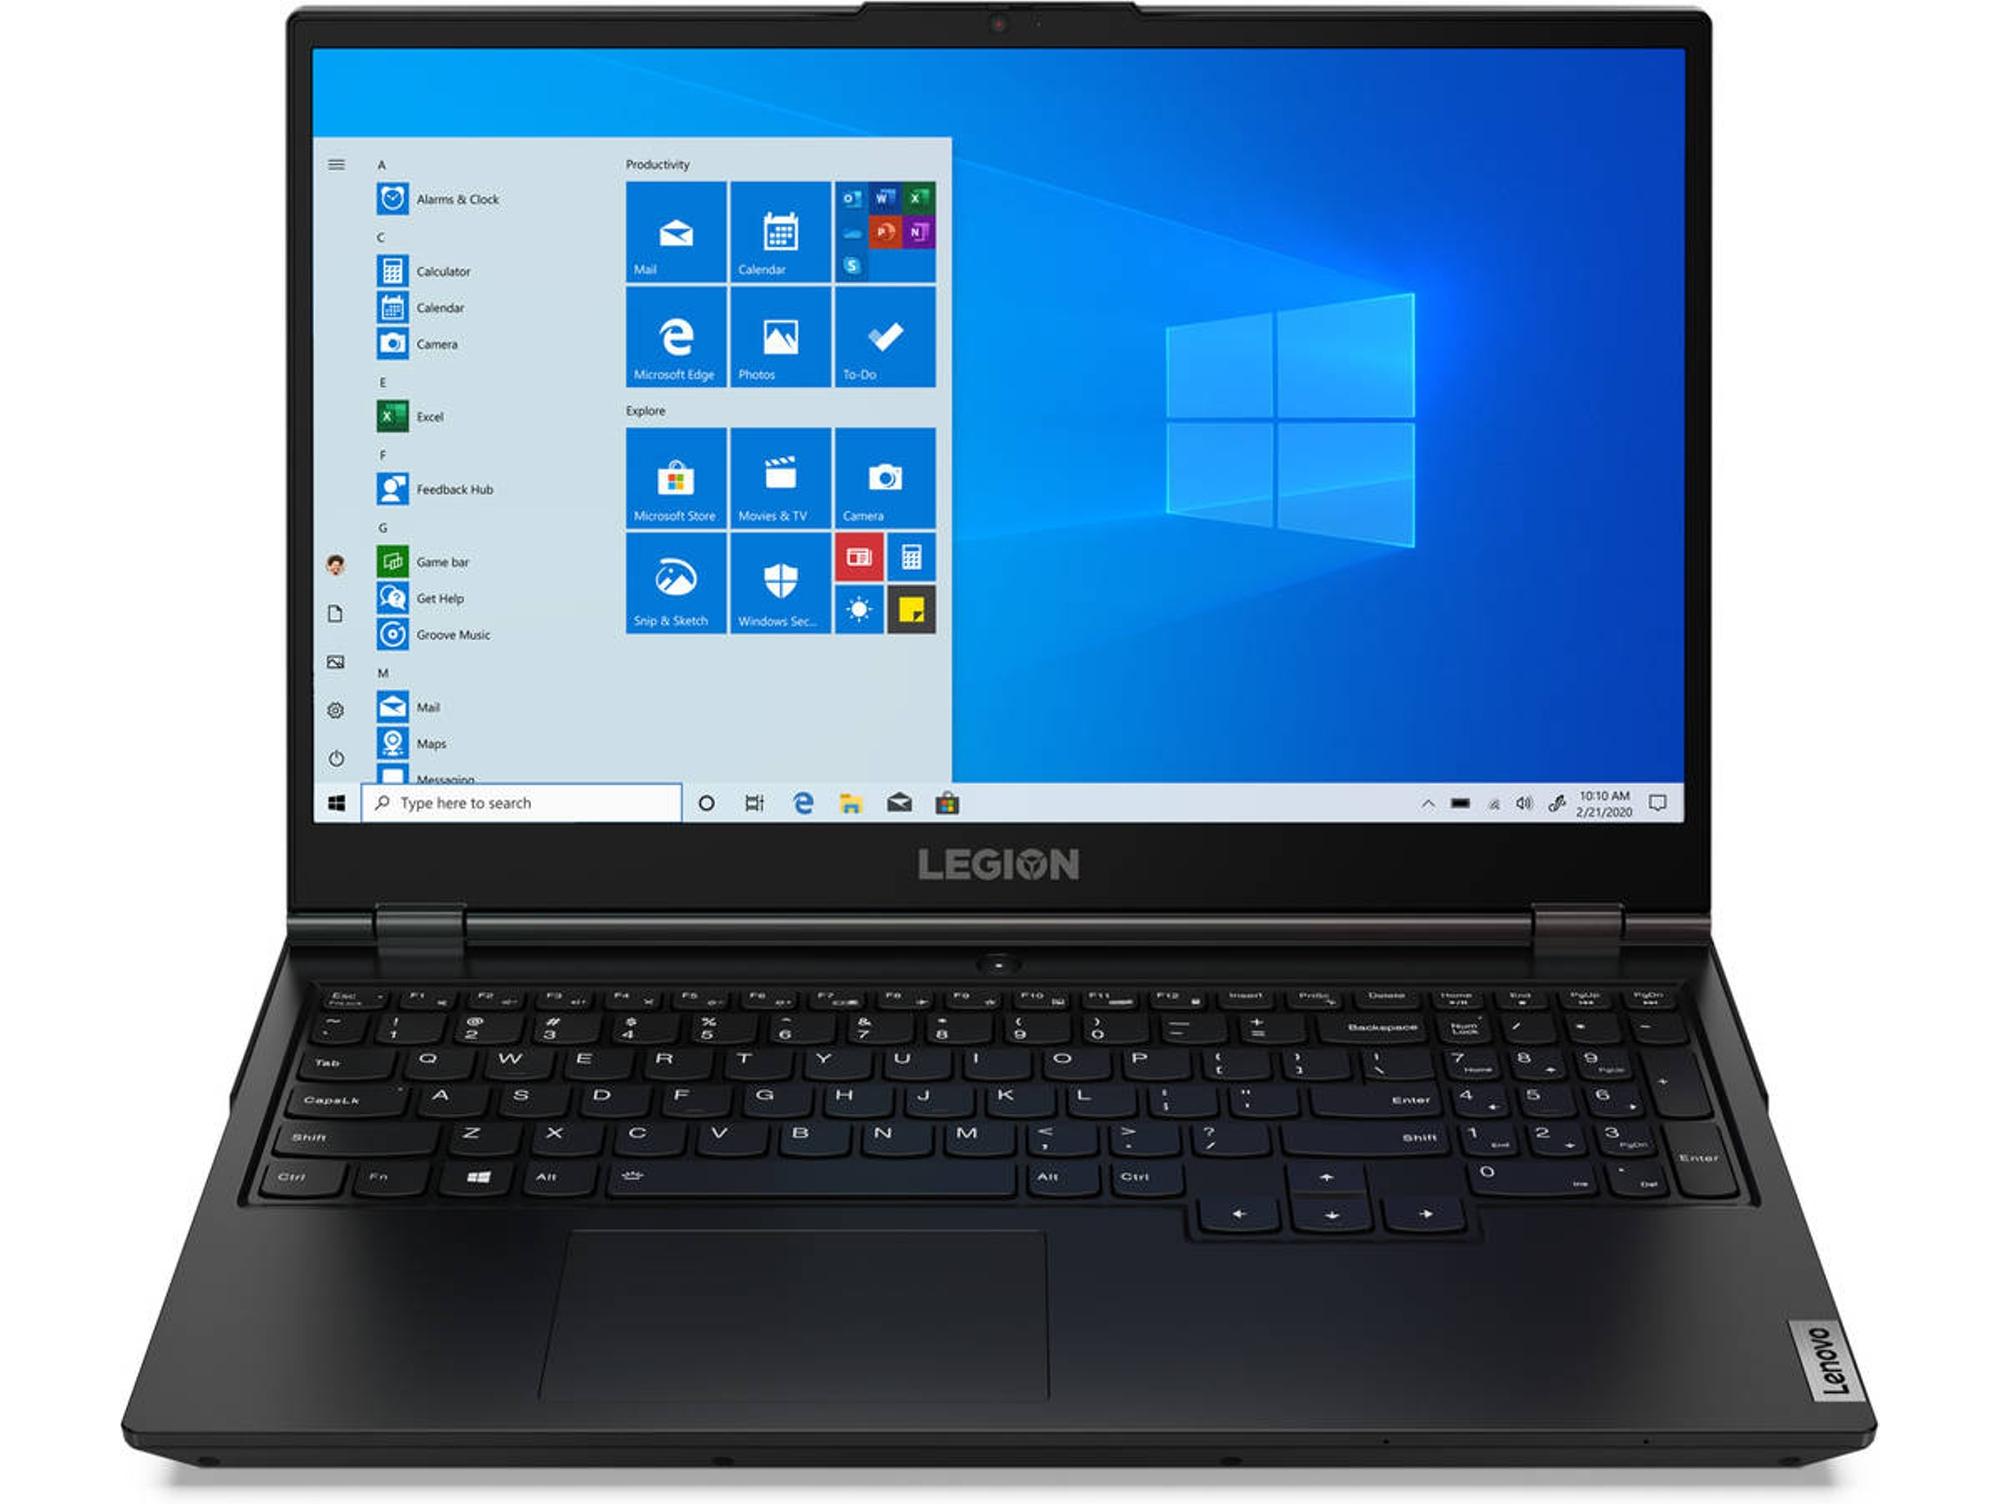 Portátil Gaming LENOVO Legion 5 15IMH05 (Intel Core i7-10750H - NVIDIA GeForce GTX 1650